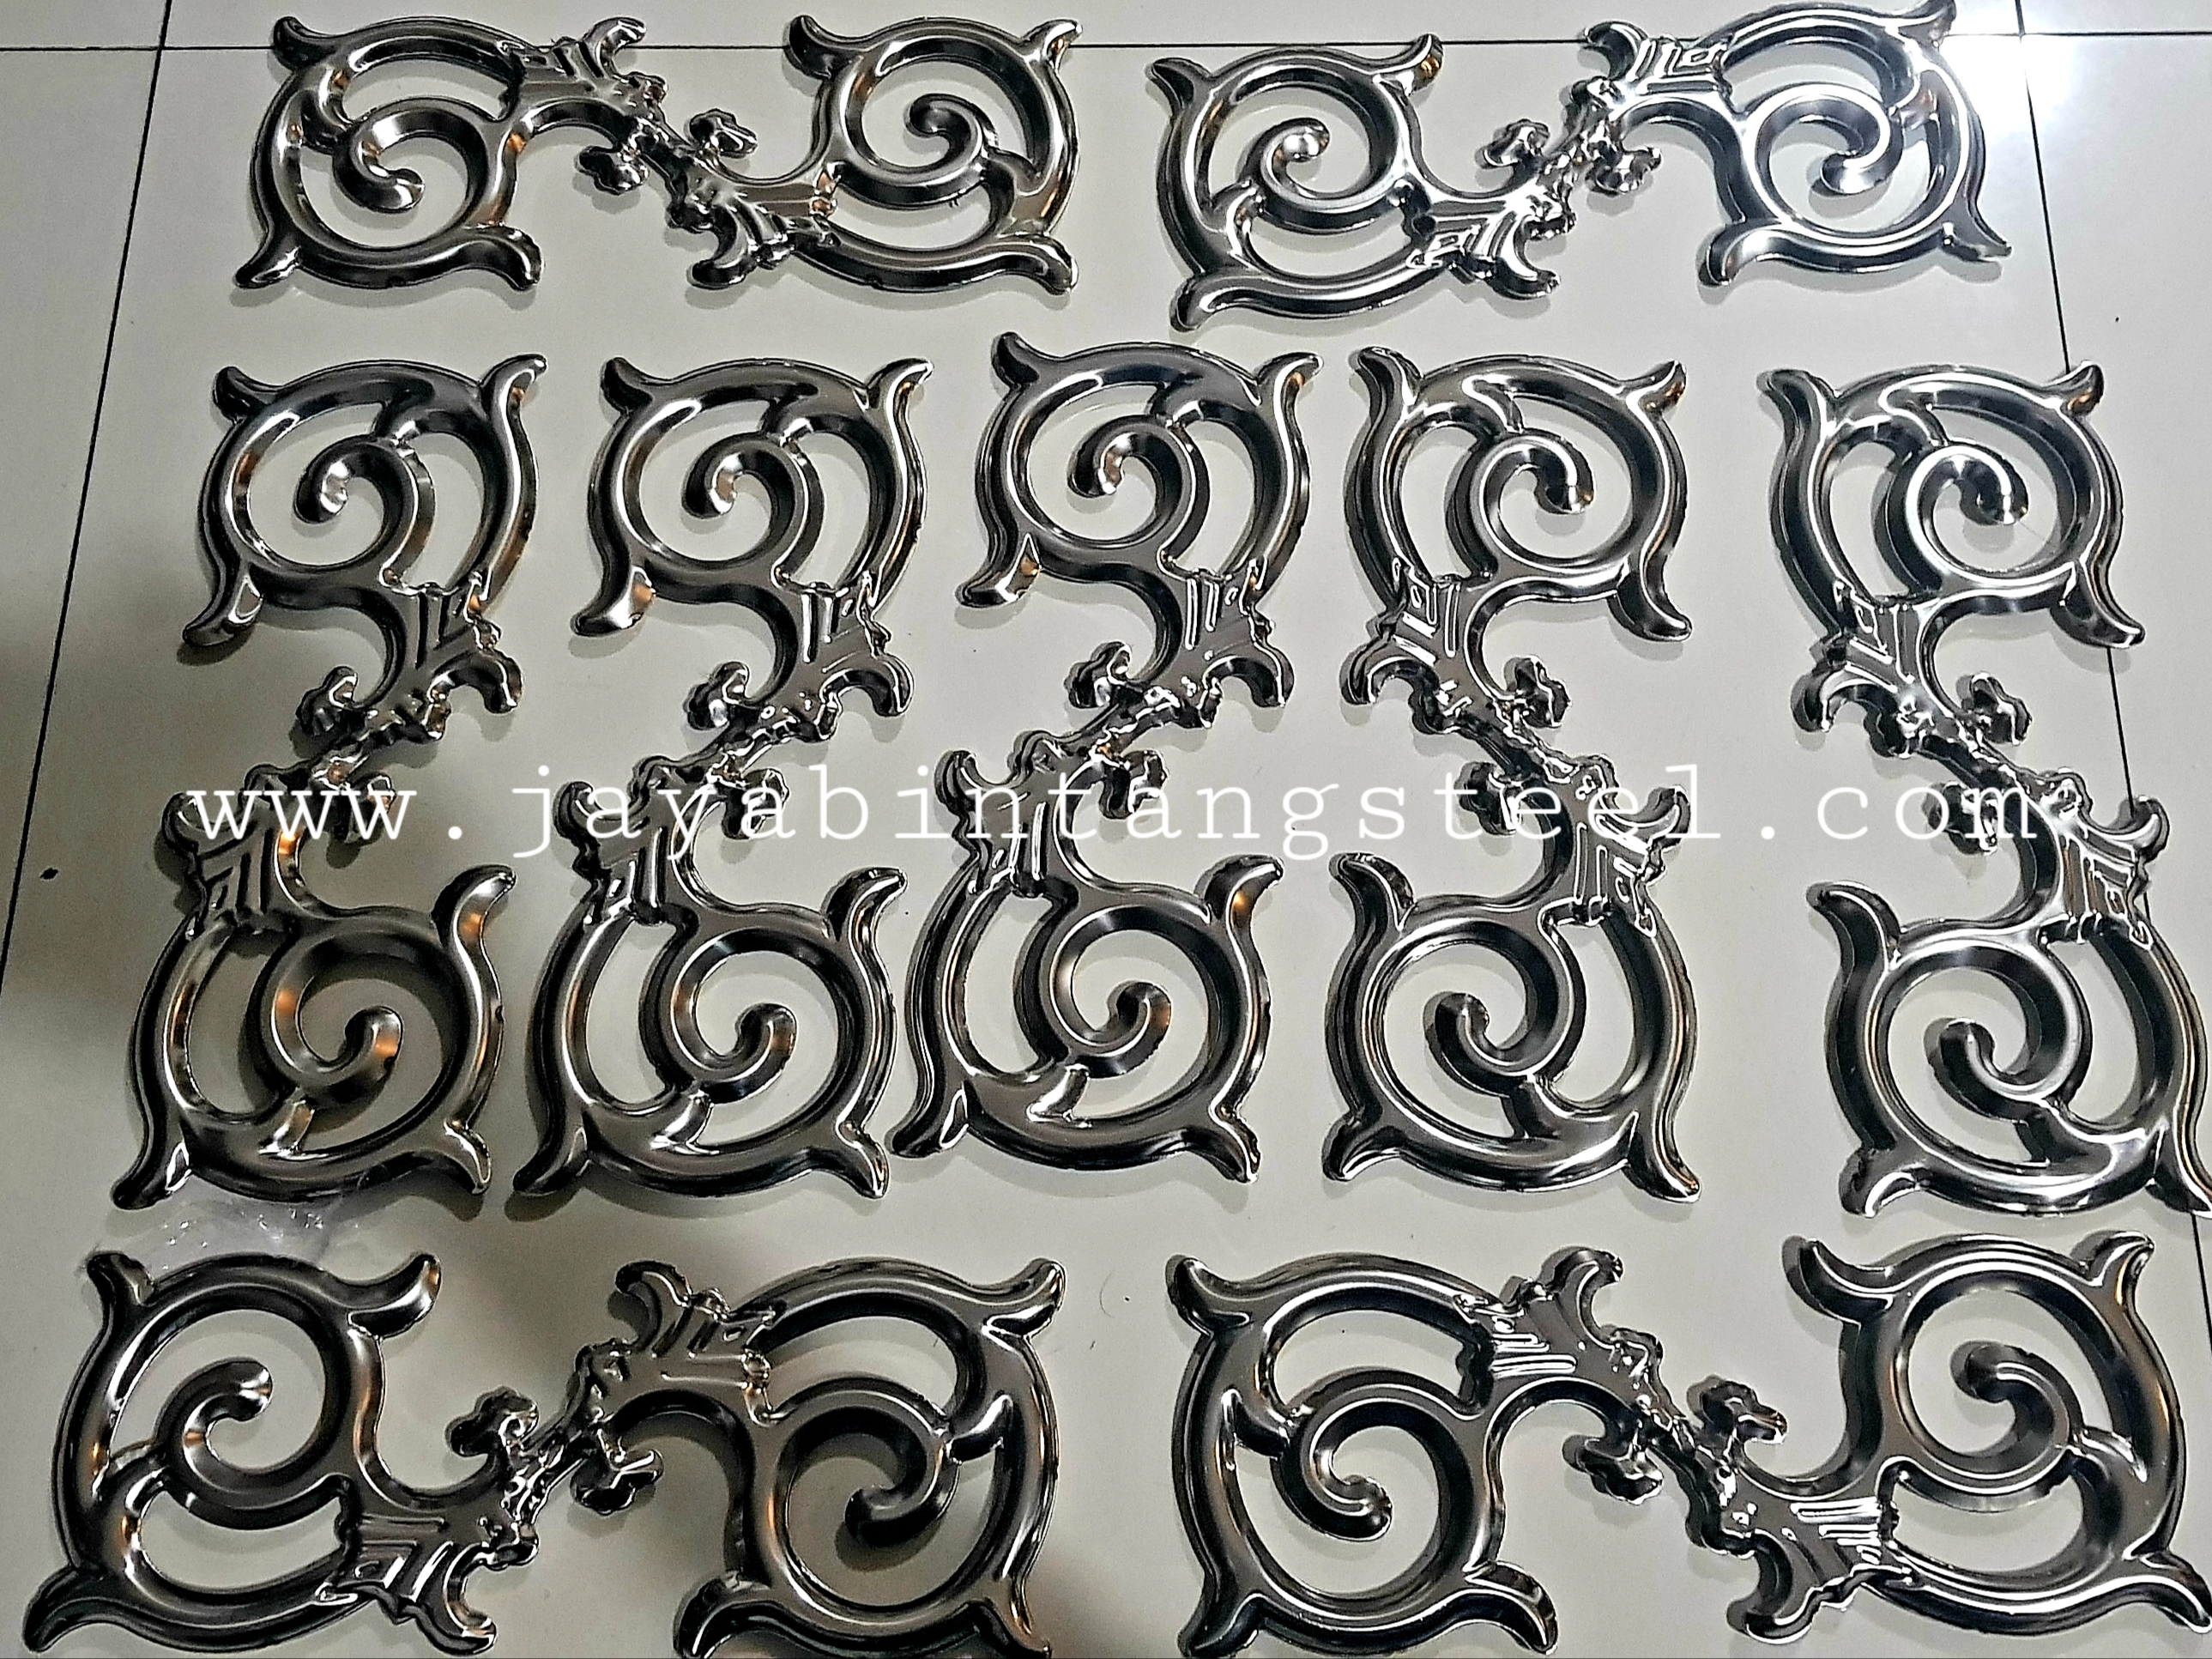 Aksesoris stainless Bunga S batik/Motif 10cmx26cm